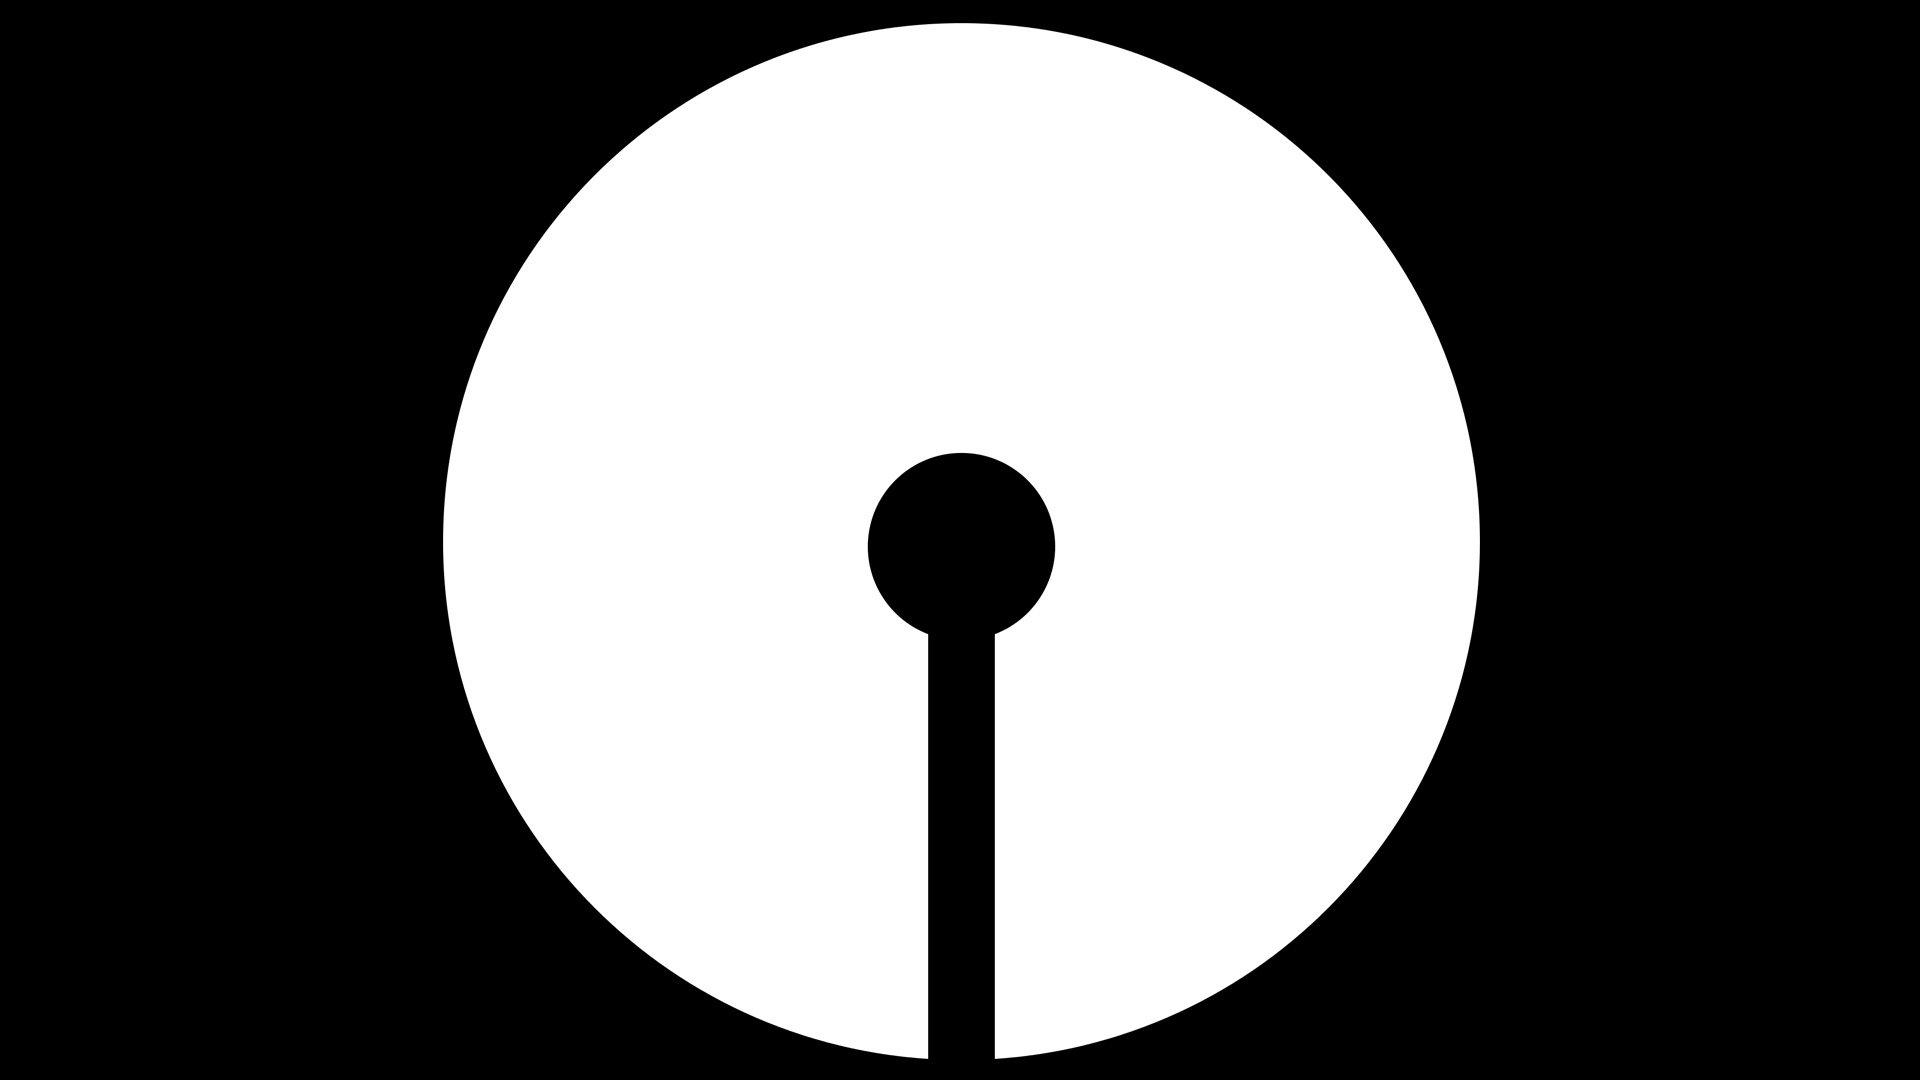 SBI Logo, SBI Symbol, Meaning, History And Evolution